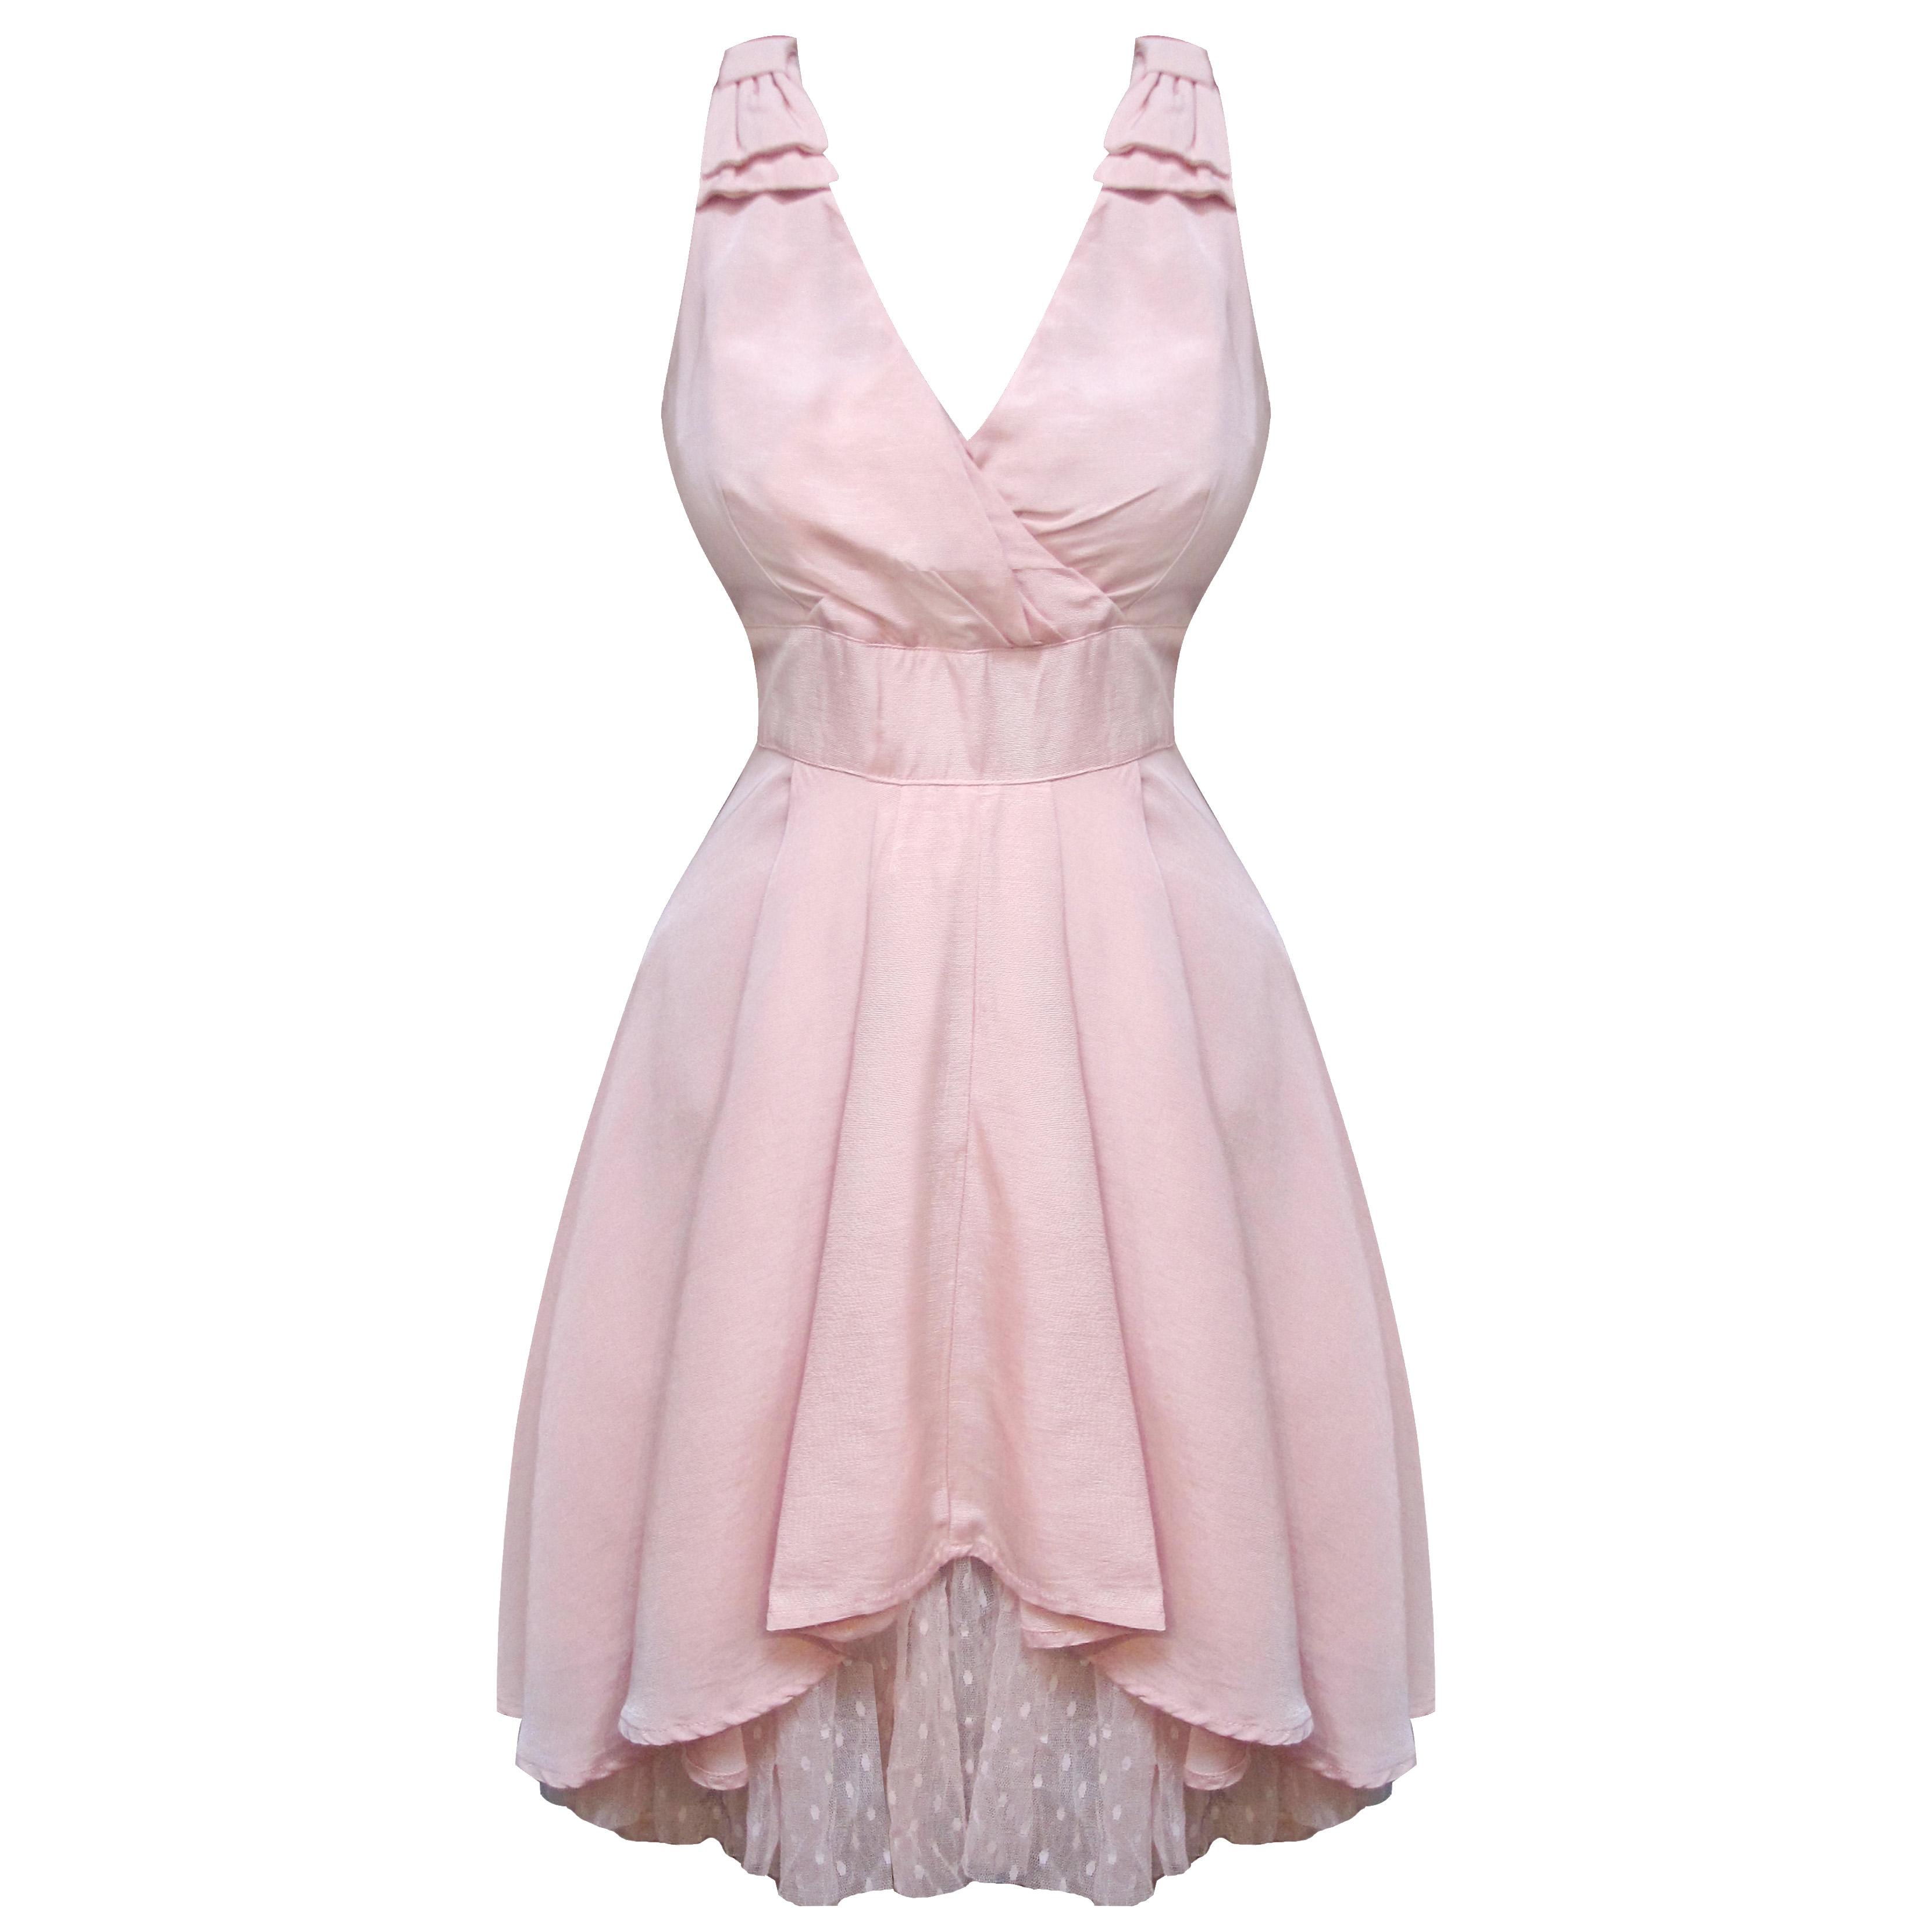 50s style prom dresses eBay